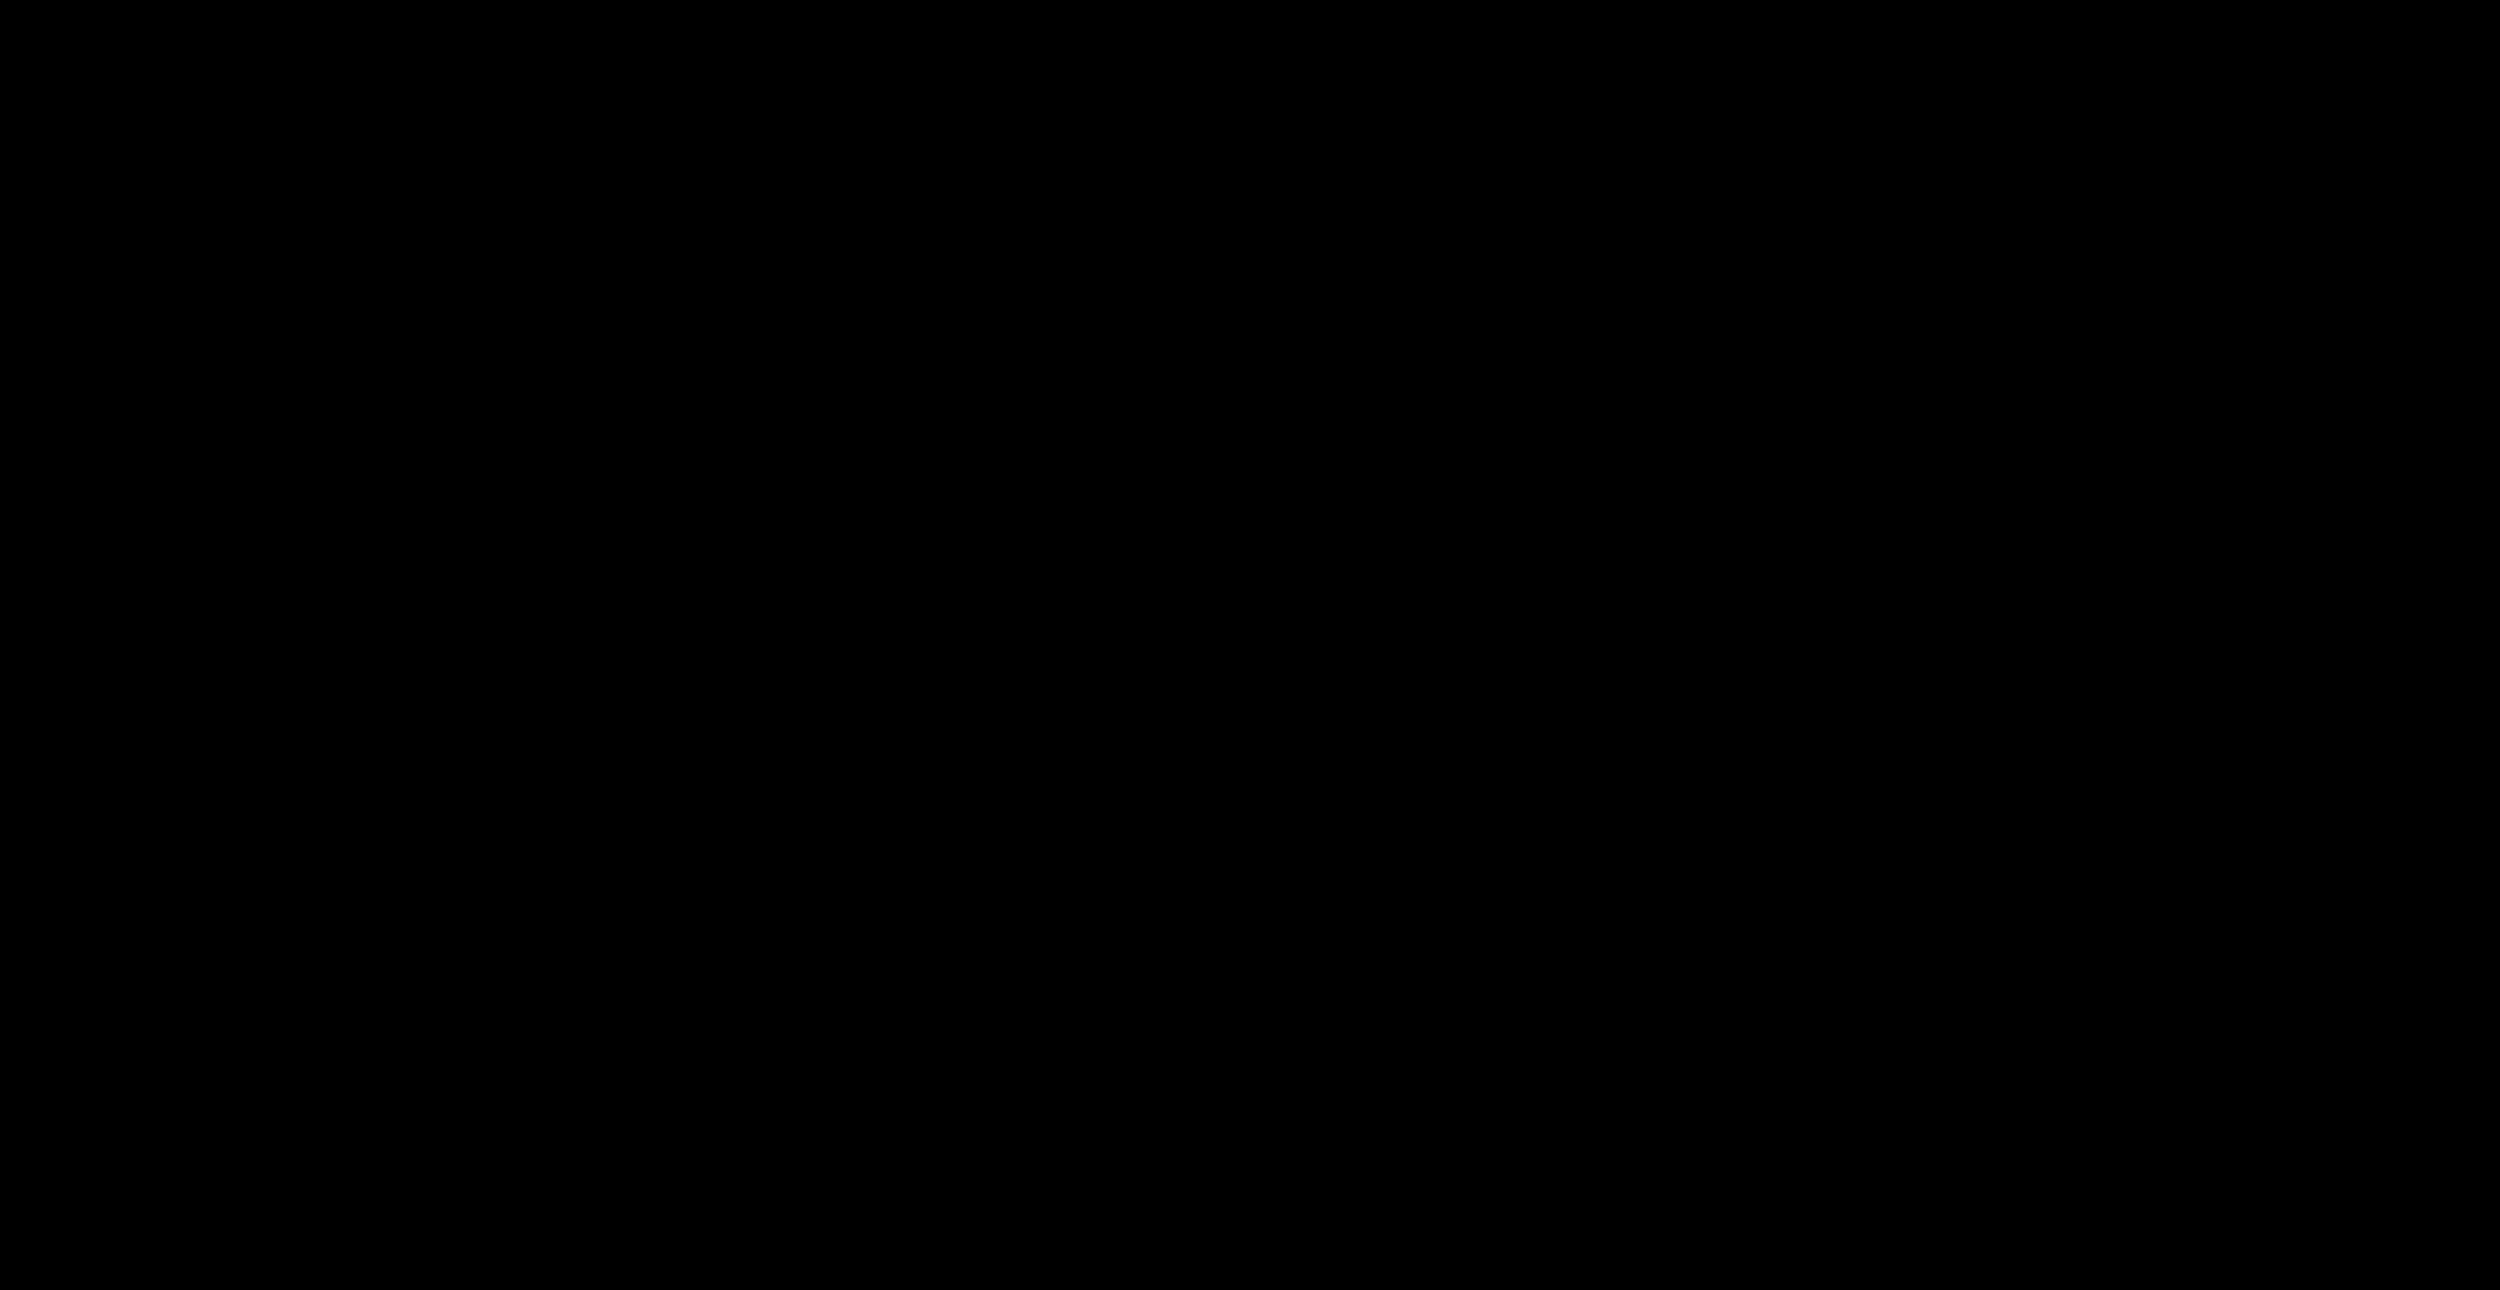 global_exploitation_logo.png